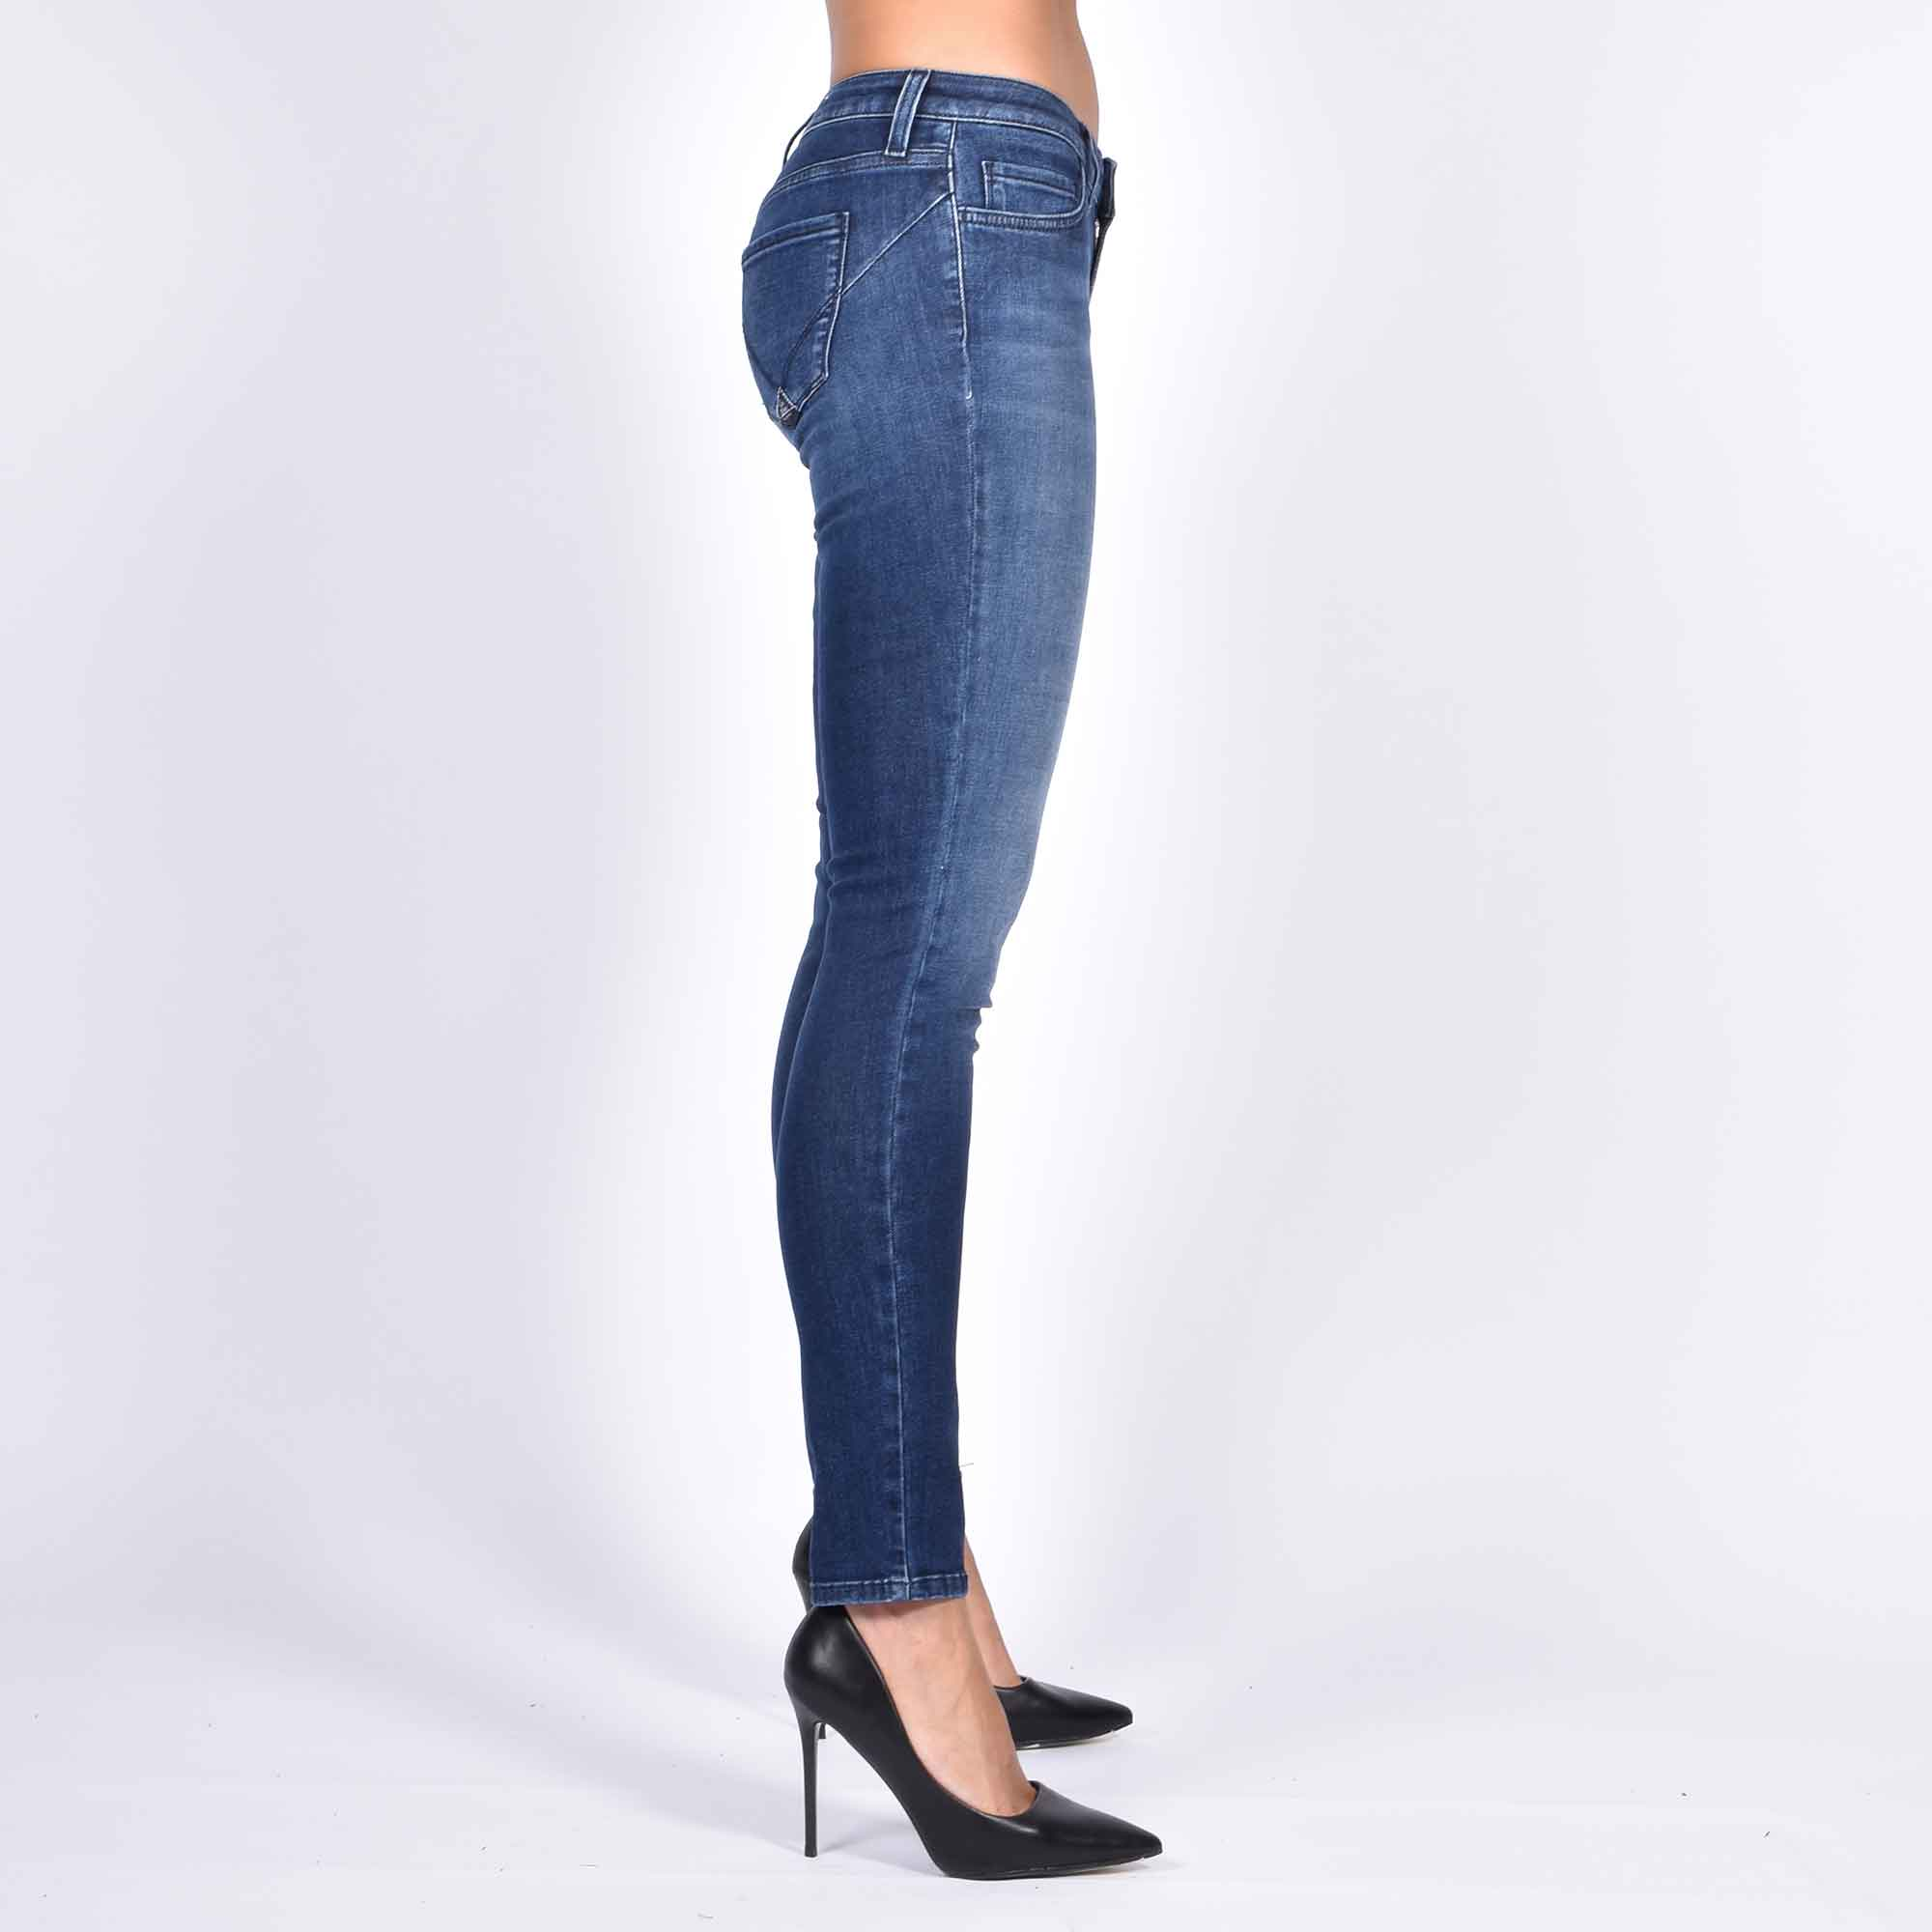 Jeans push up cindy - Denim